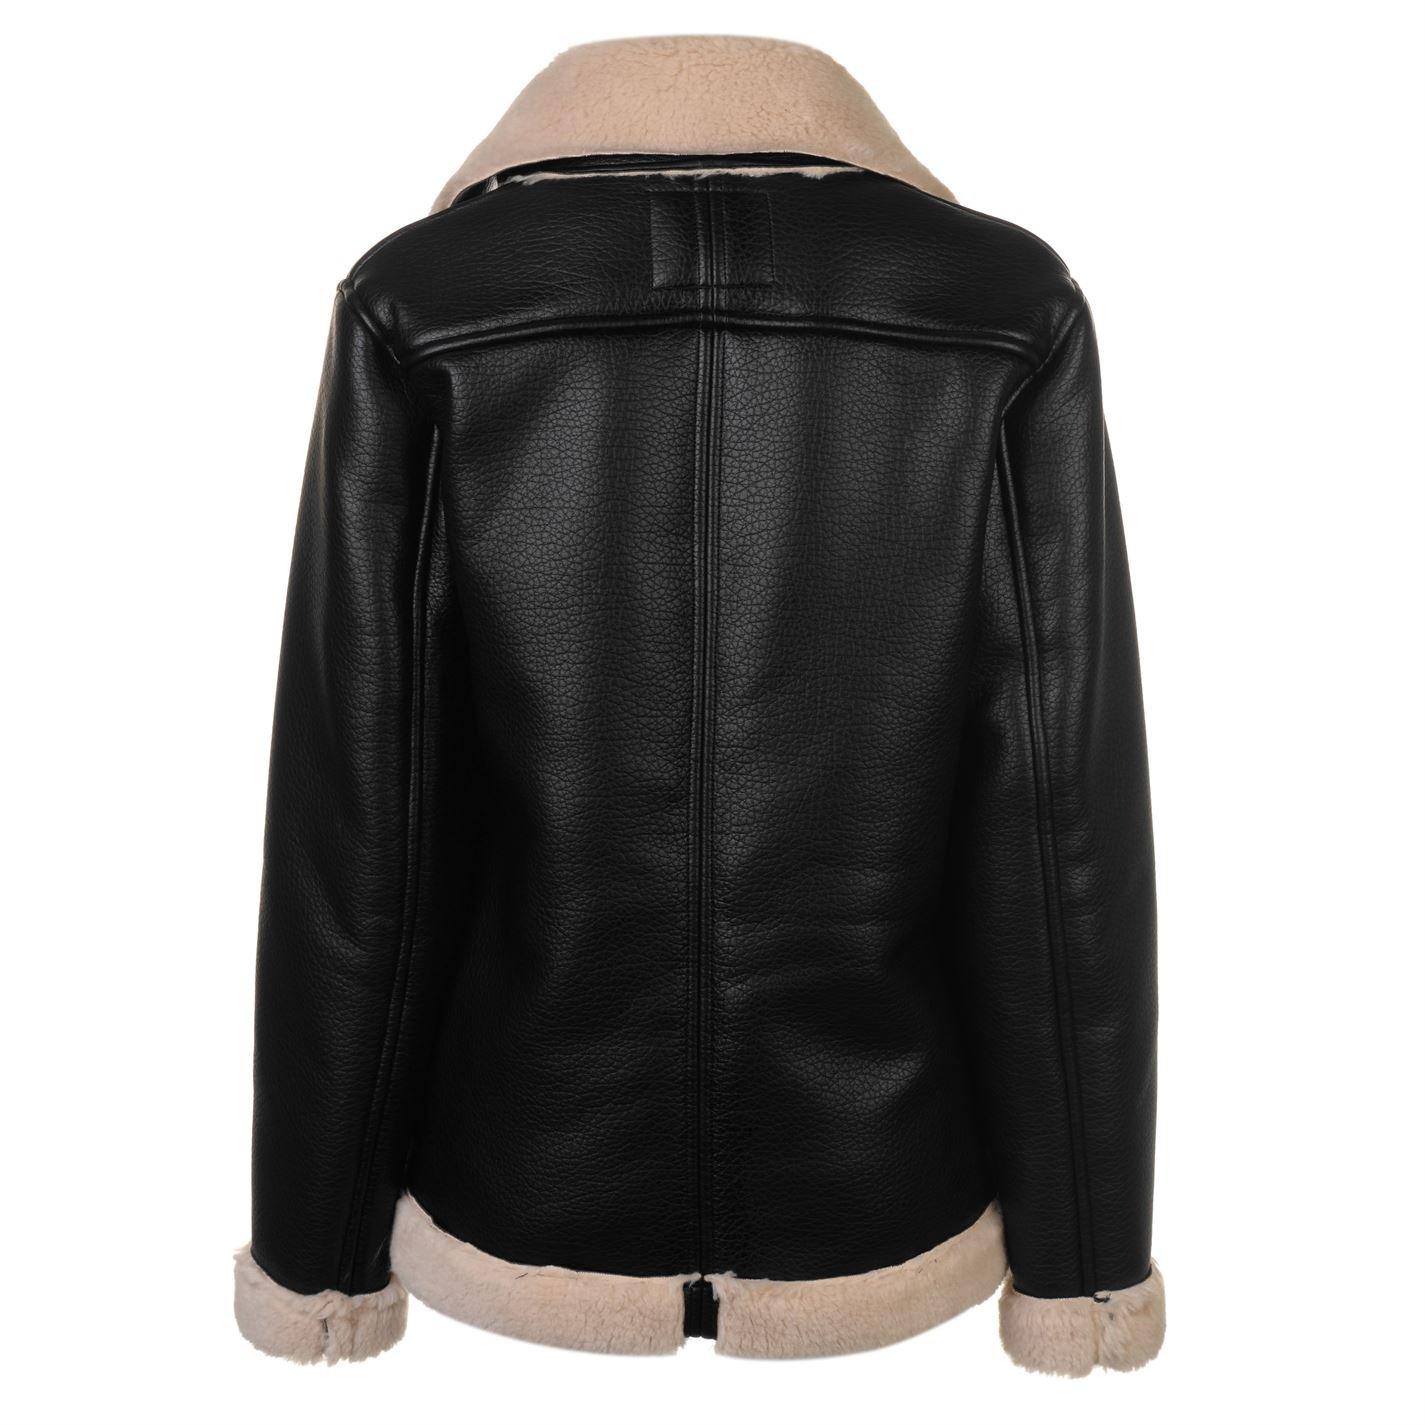 Firetrap Womens Blackseal Jacket Leather PU Coat Top Zip Full Black 14 (L)   Amazon.co.uk  Clothing 5ecac1520